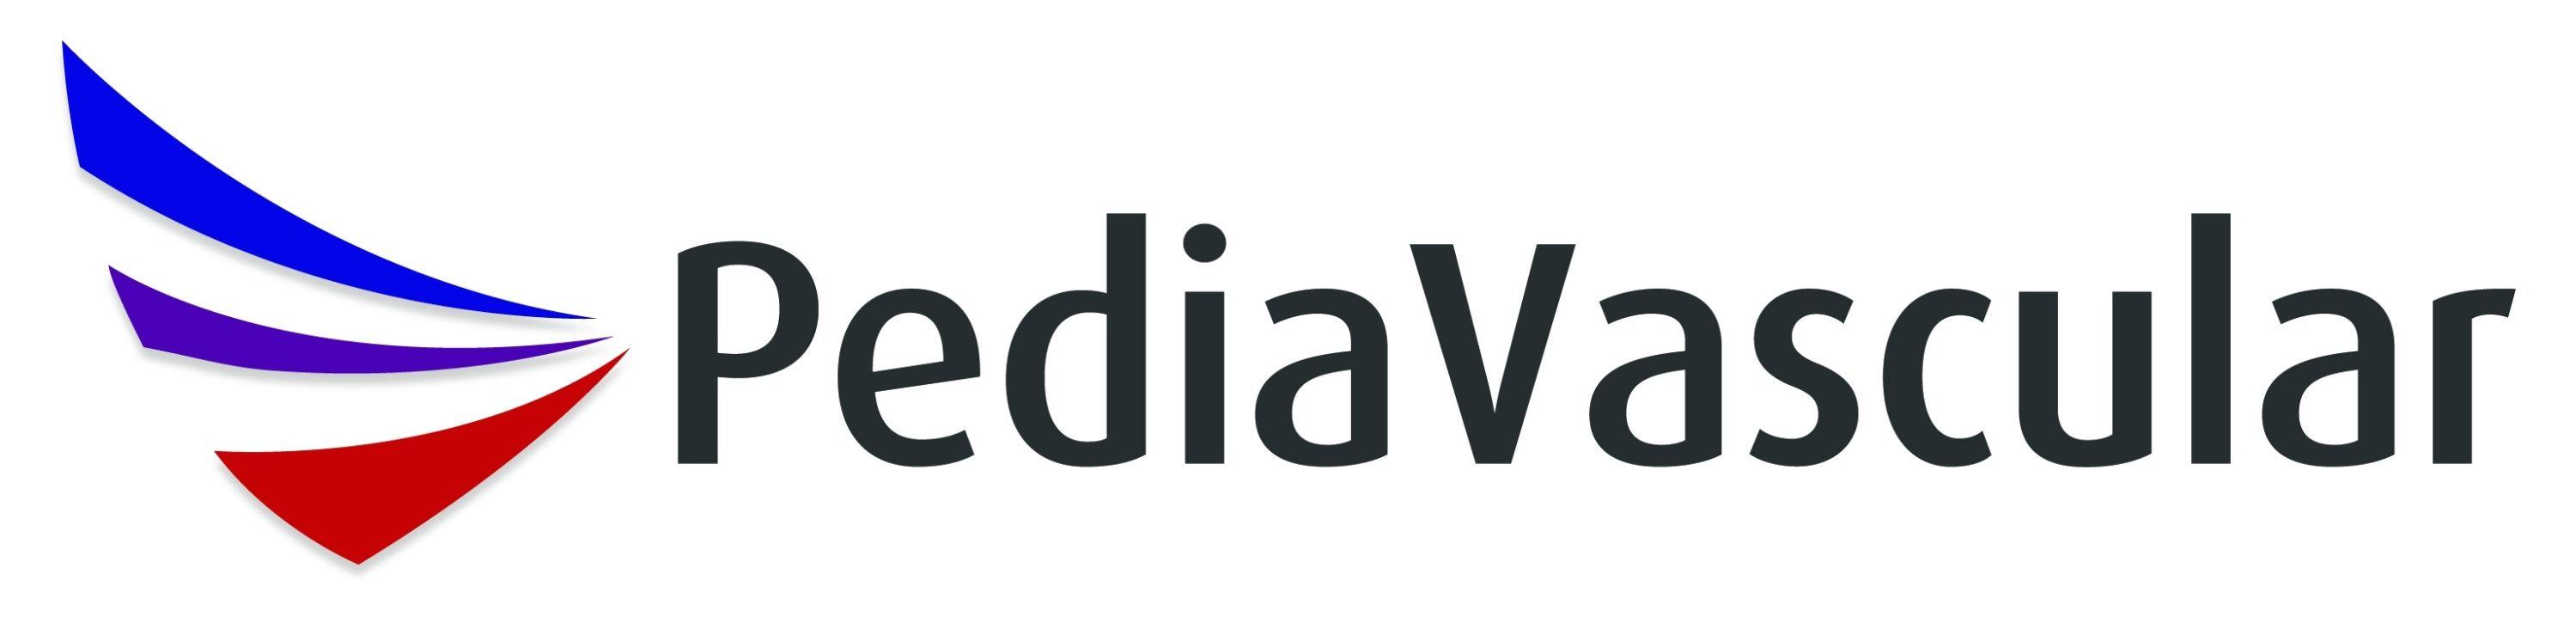 PediaVascular Logo